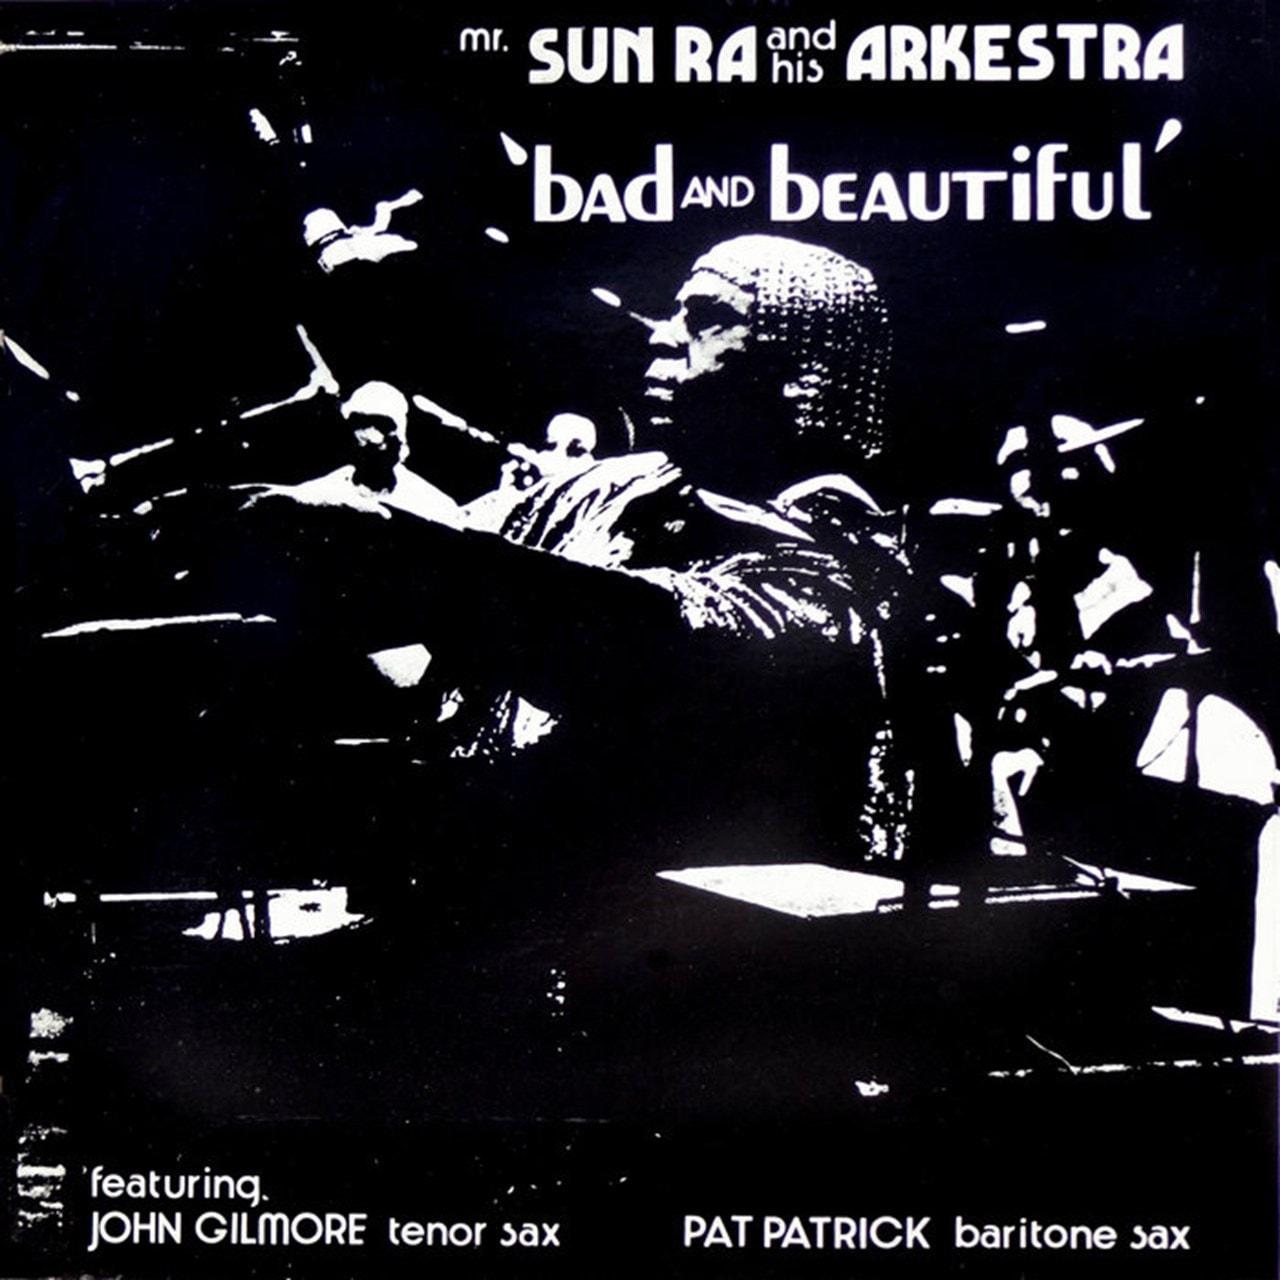 Bad and Beautiful - 1